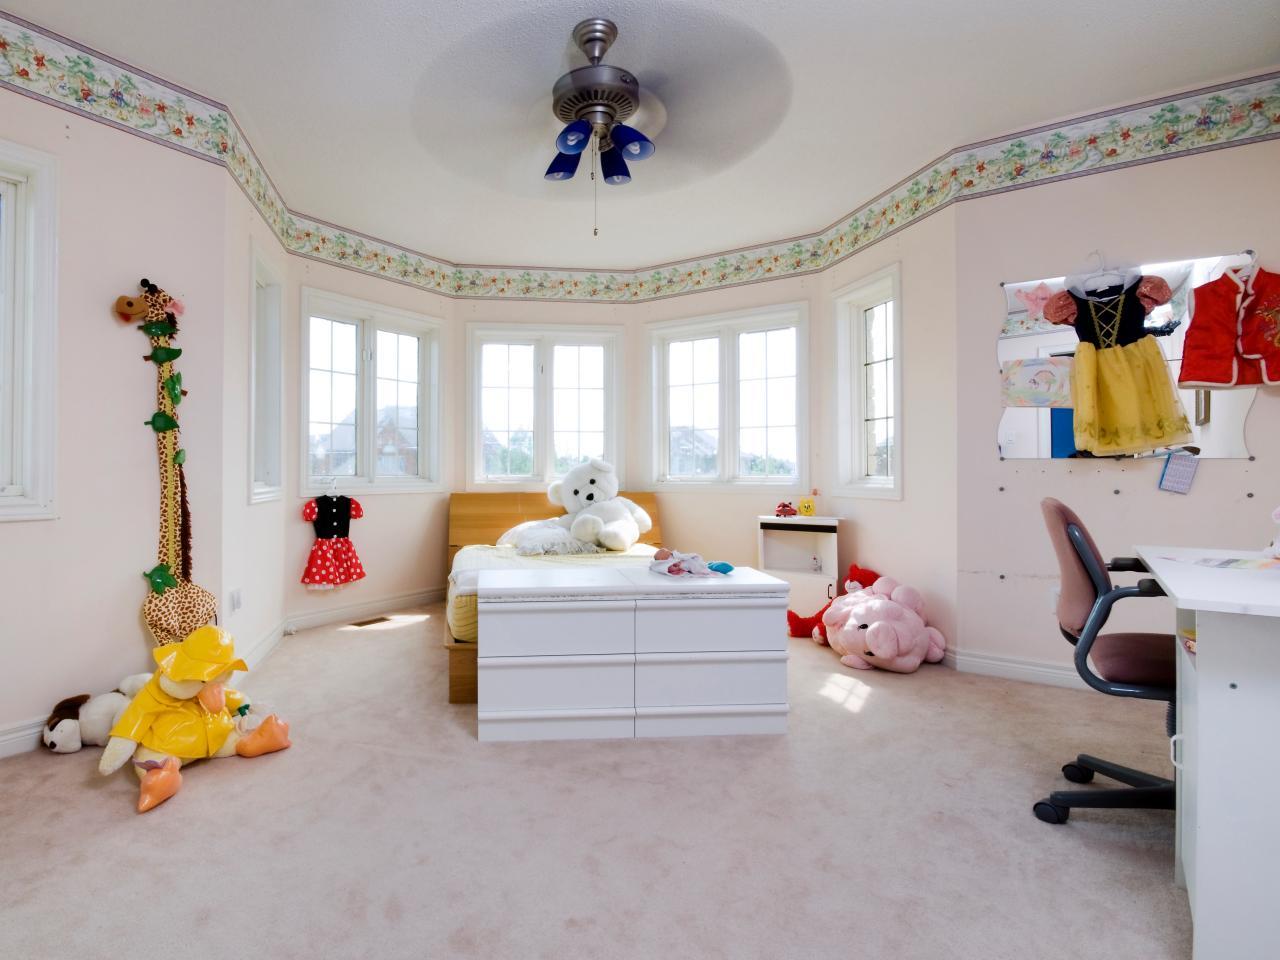 Candice olson bedroom for kids | Hawk Haven